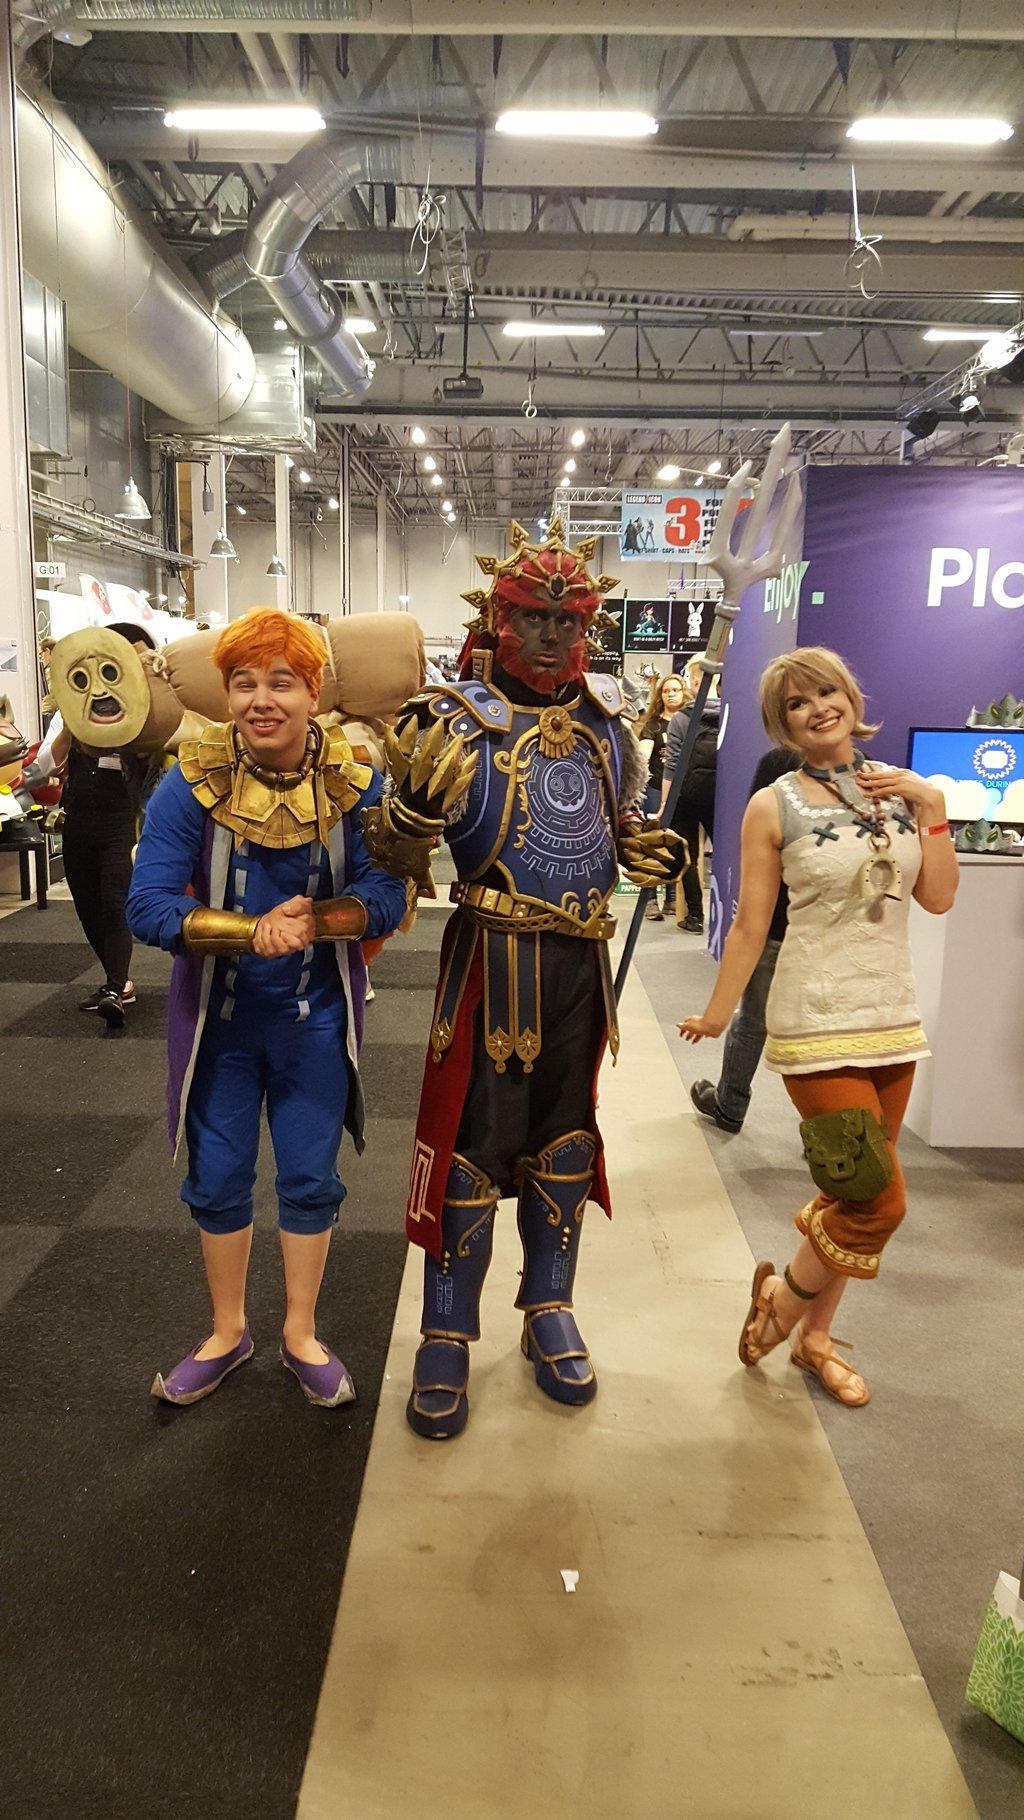 Zelda characters by EgonEagle